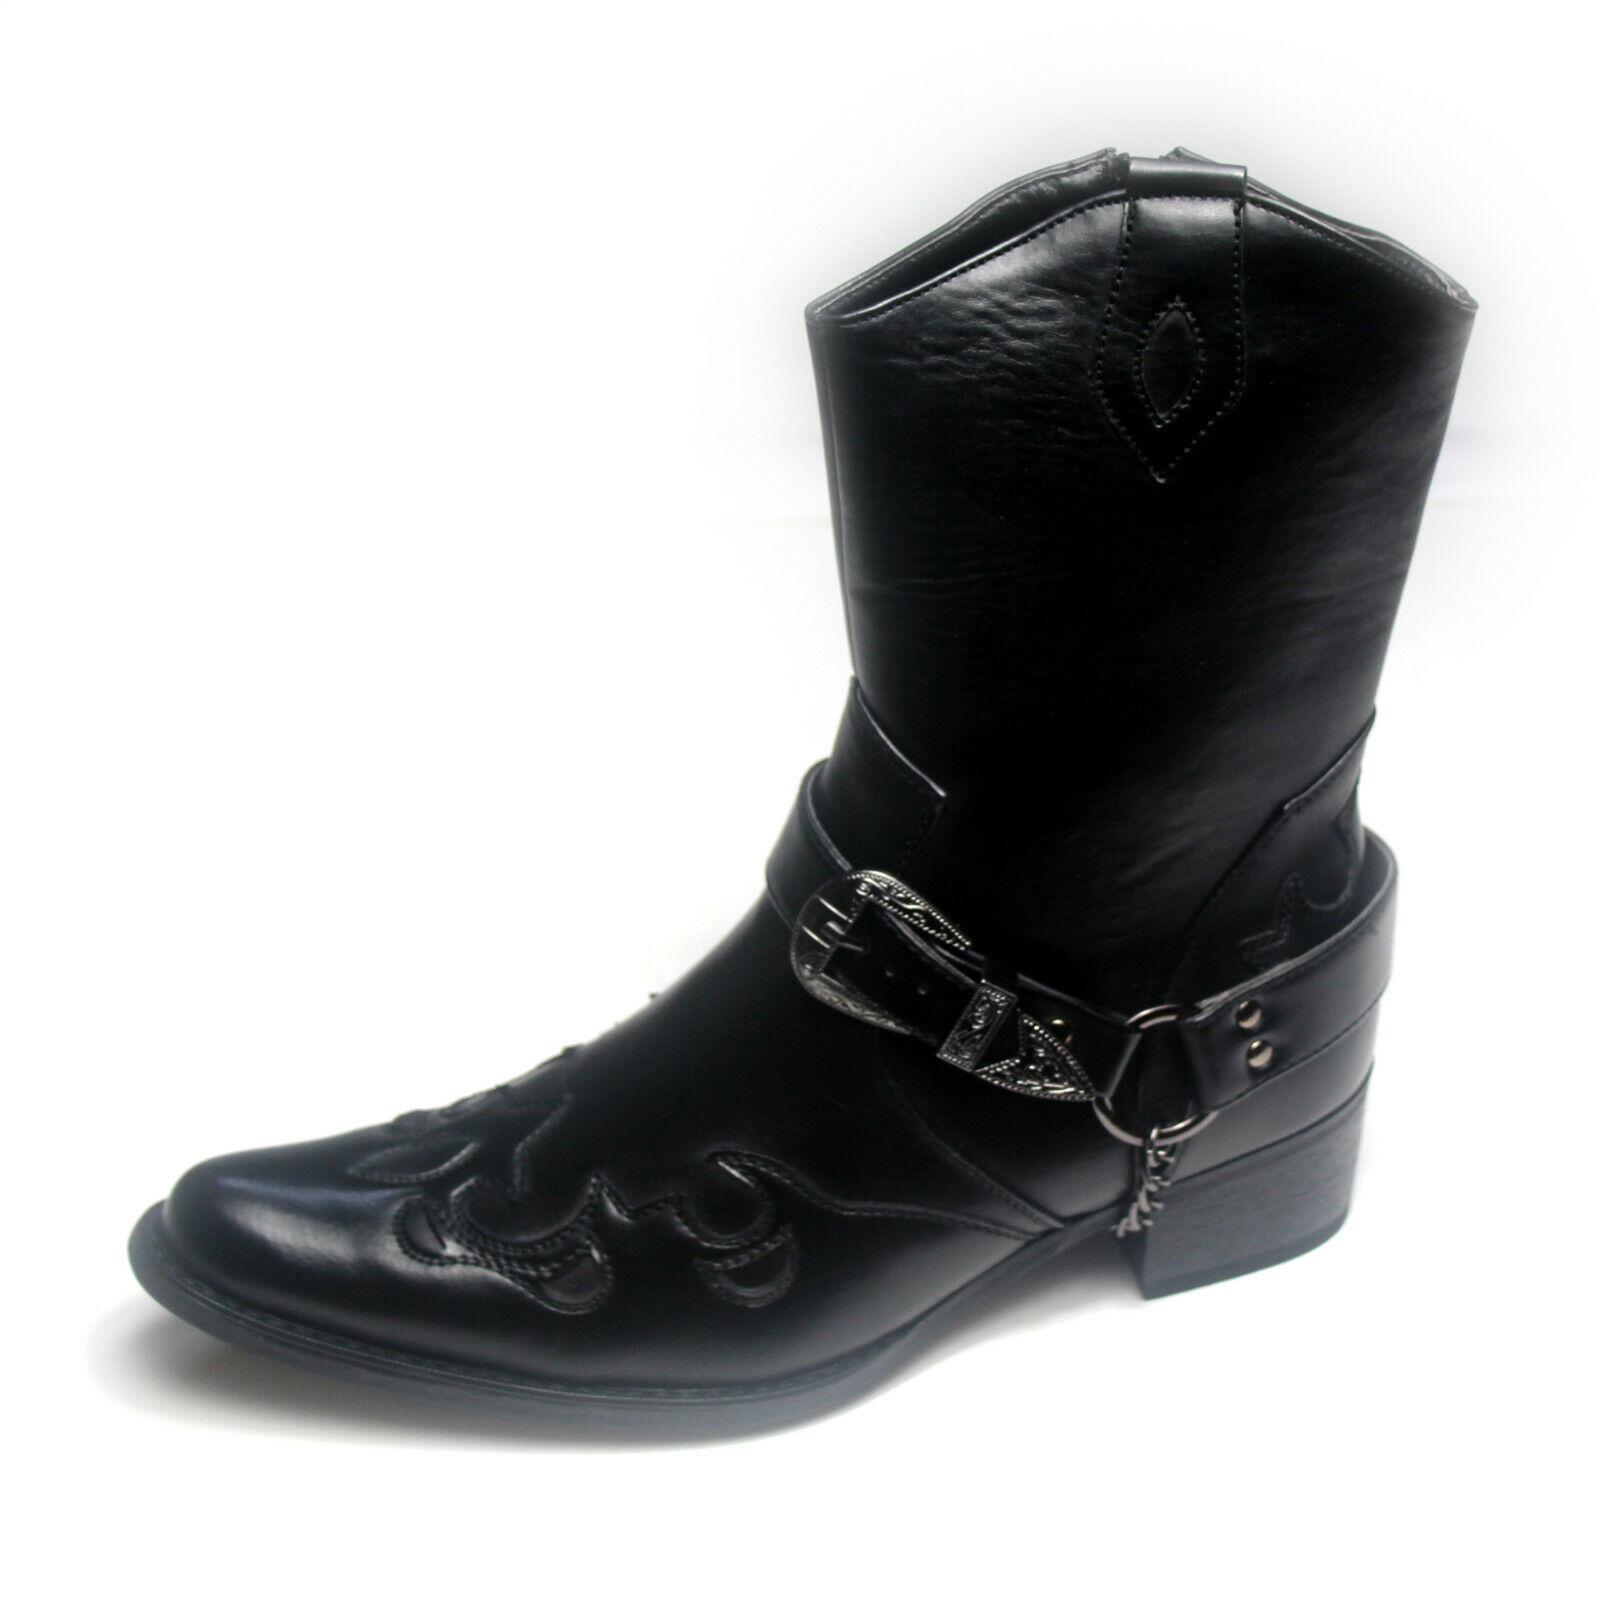 Mens Gents Full Zip Western Cowboy Ankle Boots Colour Black Size 9